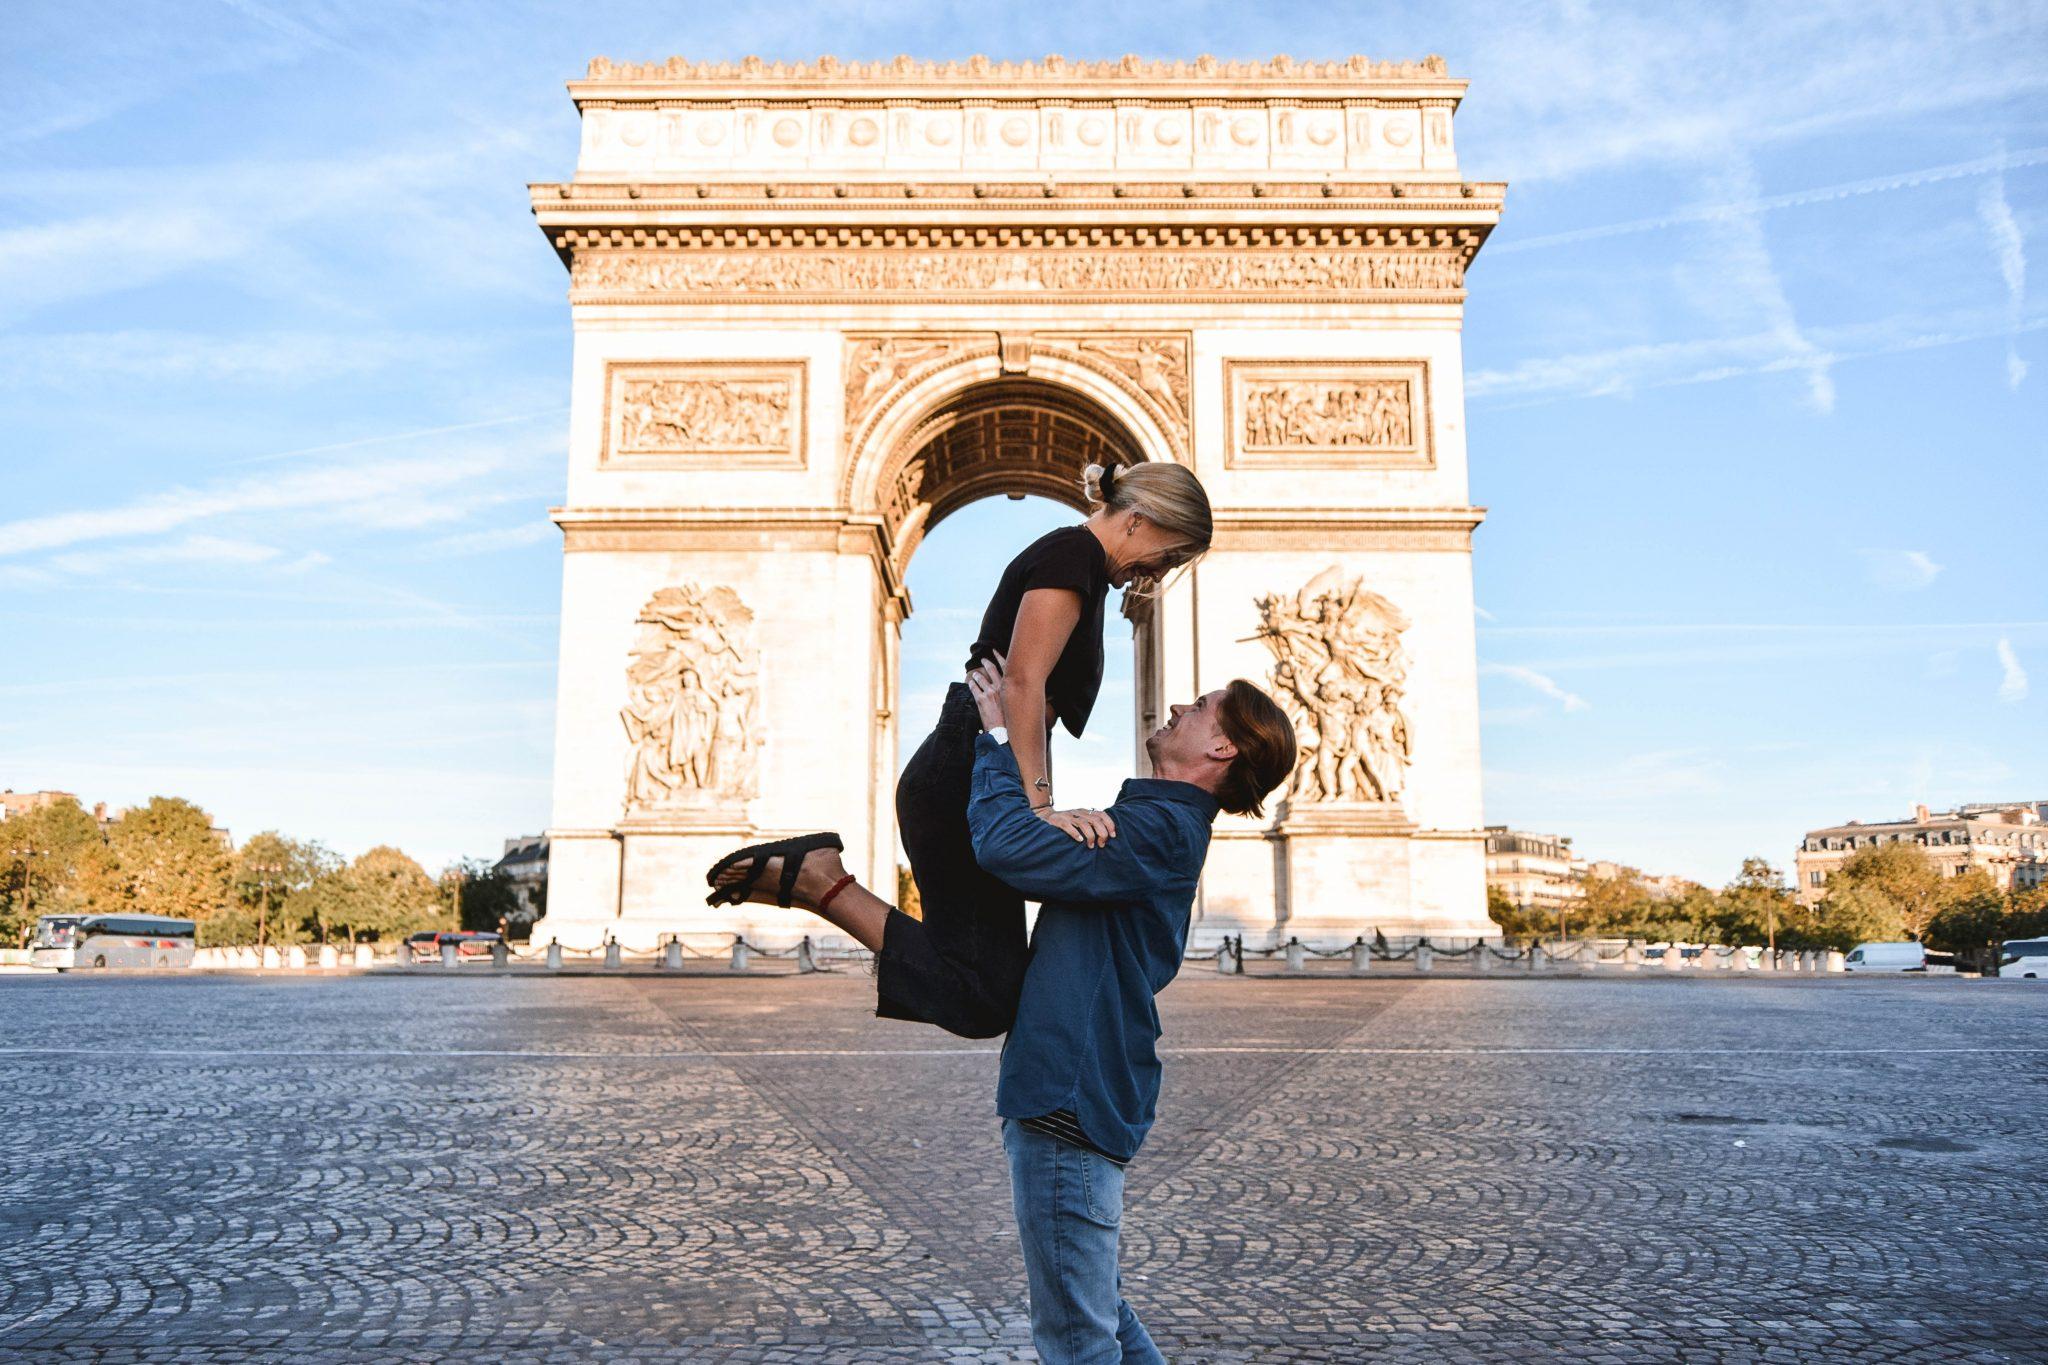 Wanderers & Warriors - Charlie & Lauren UK Travel Couple - Two Days In Paris Itinerary - Arc De Triomphe Paris